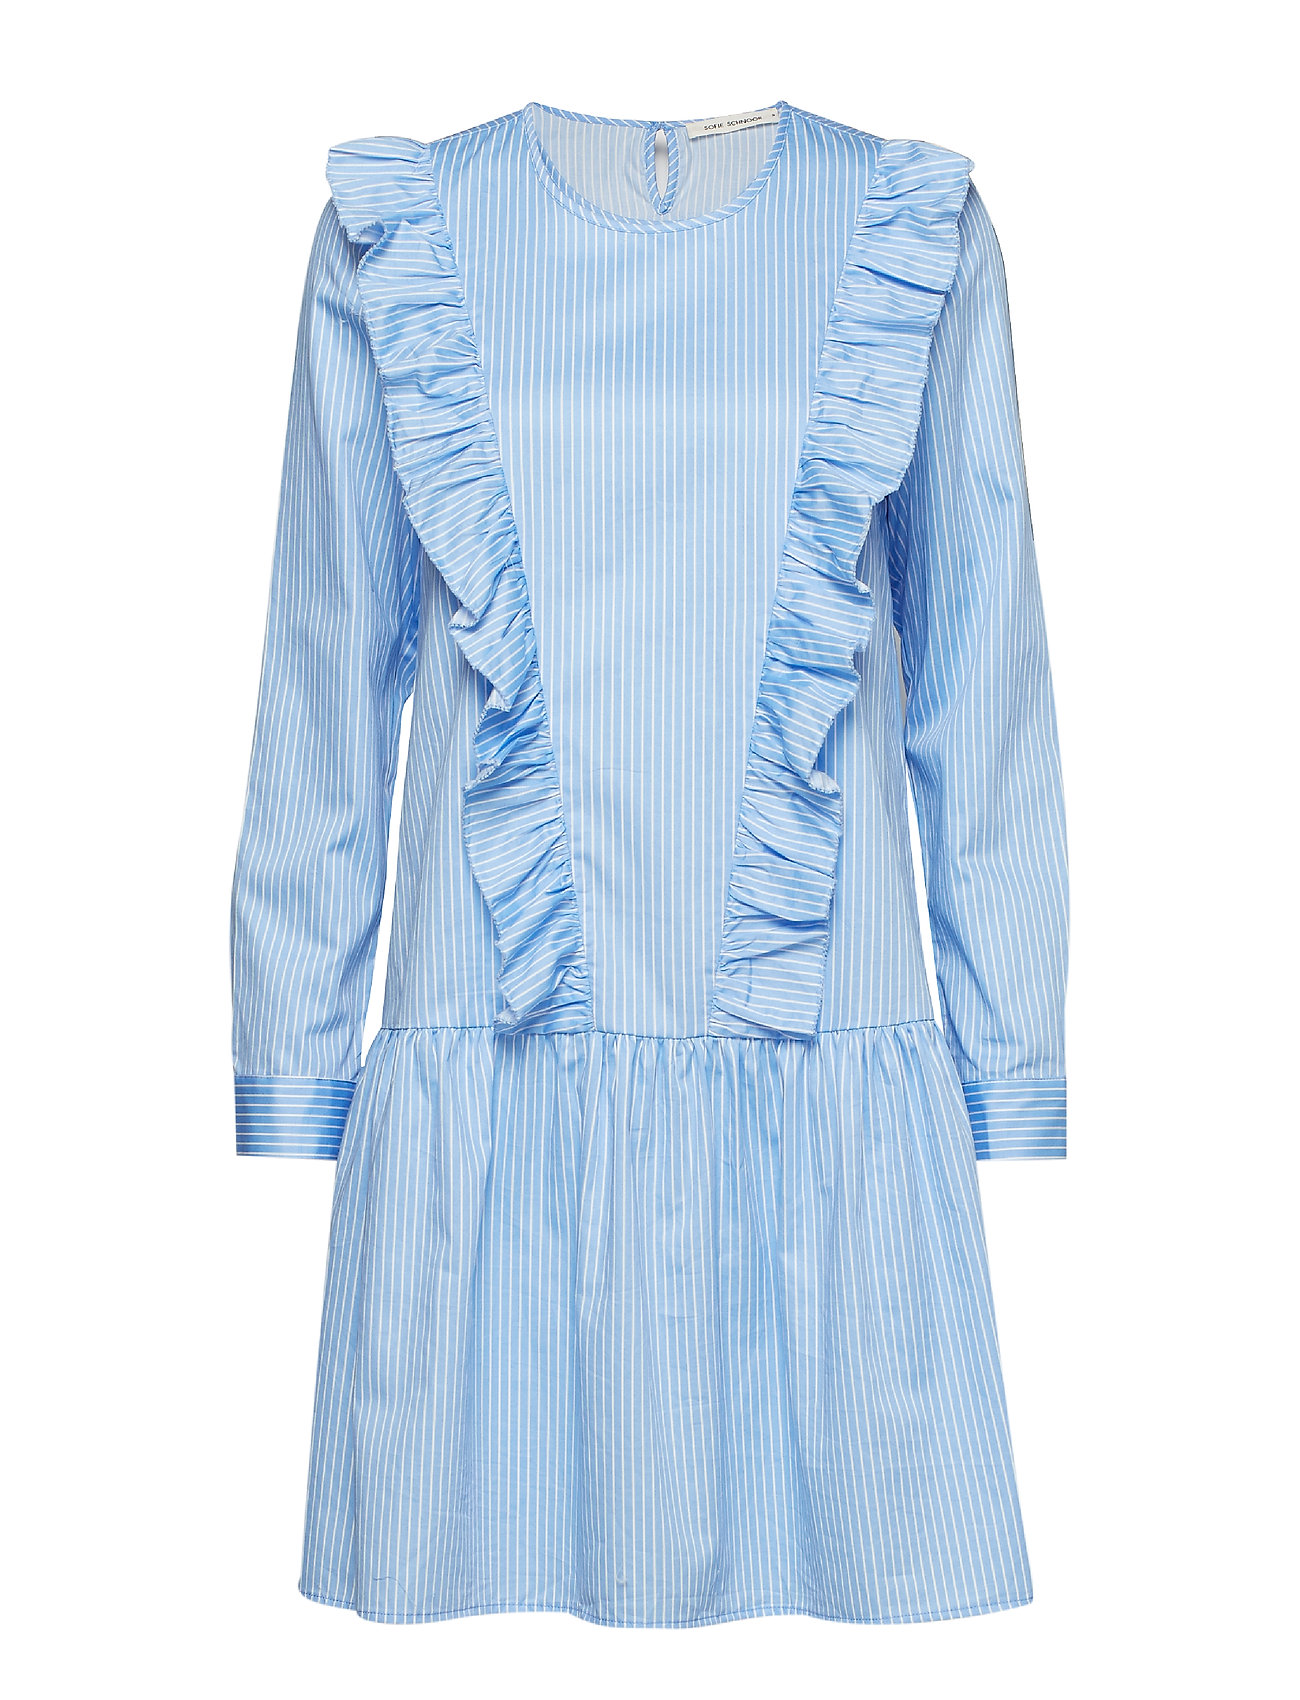 Image of Dress (3123579417)